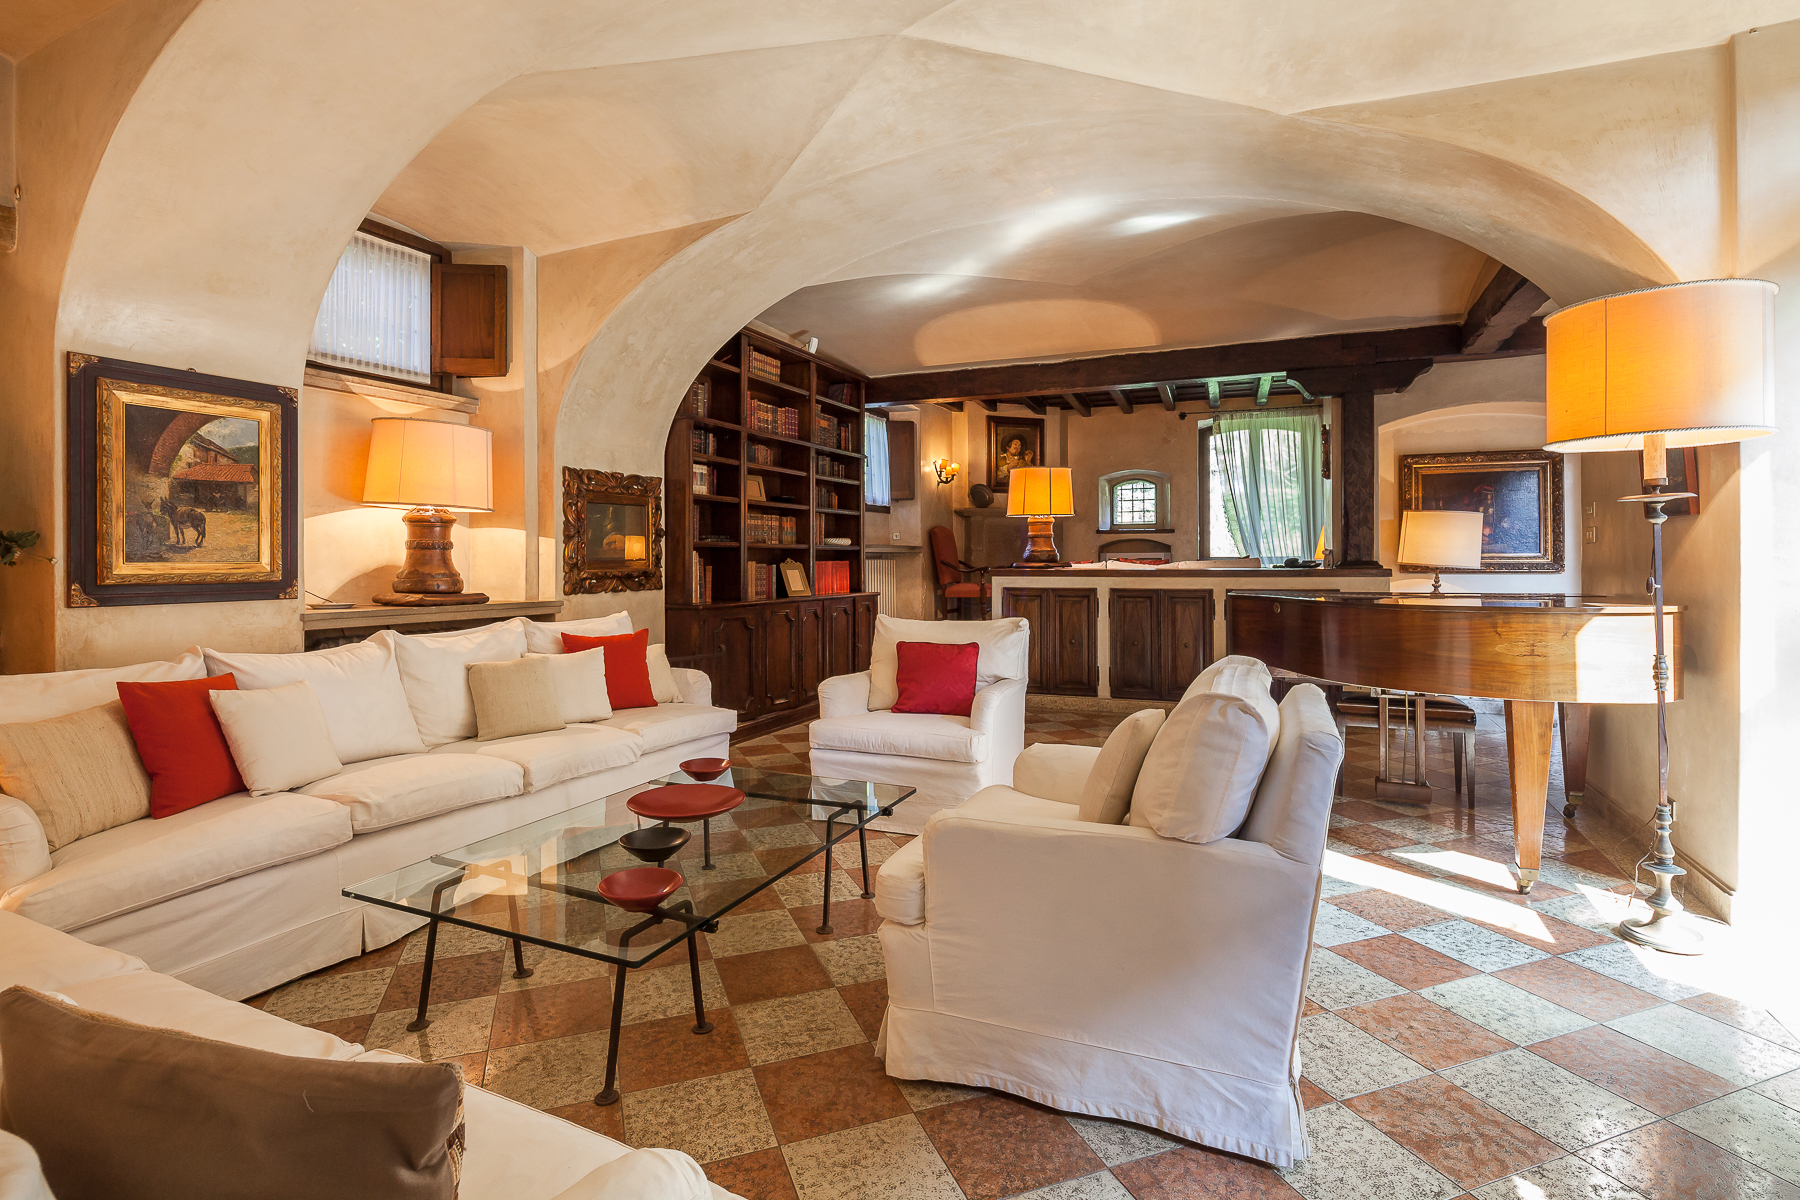 Villa in Vendita a Gorle: 5 locali, 850 mq - Foto 7